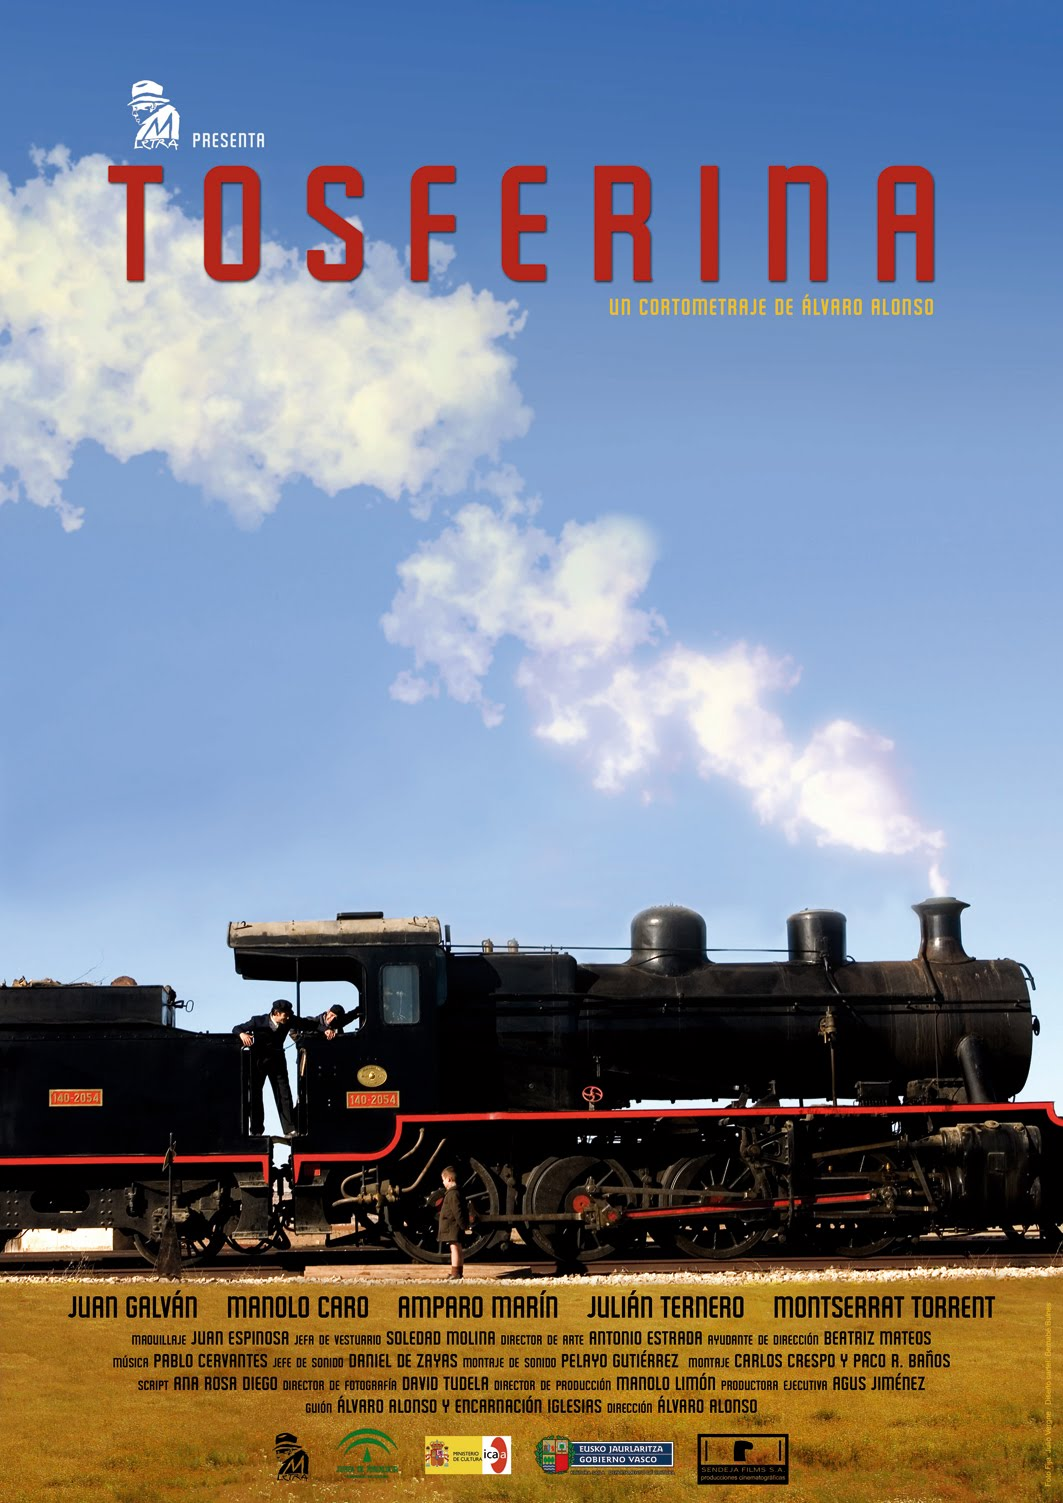 Cartel-Tosferina_v2-copia-c